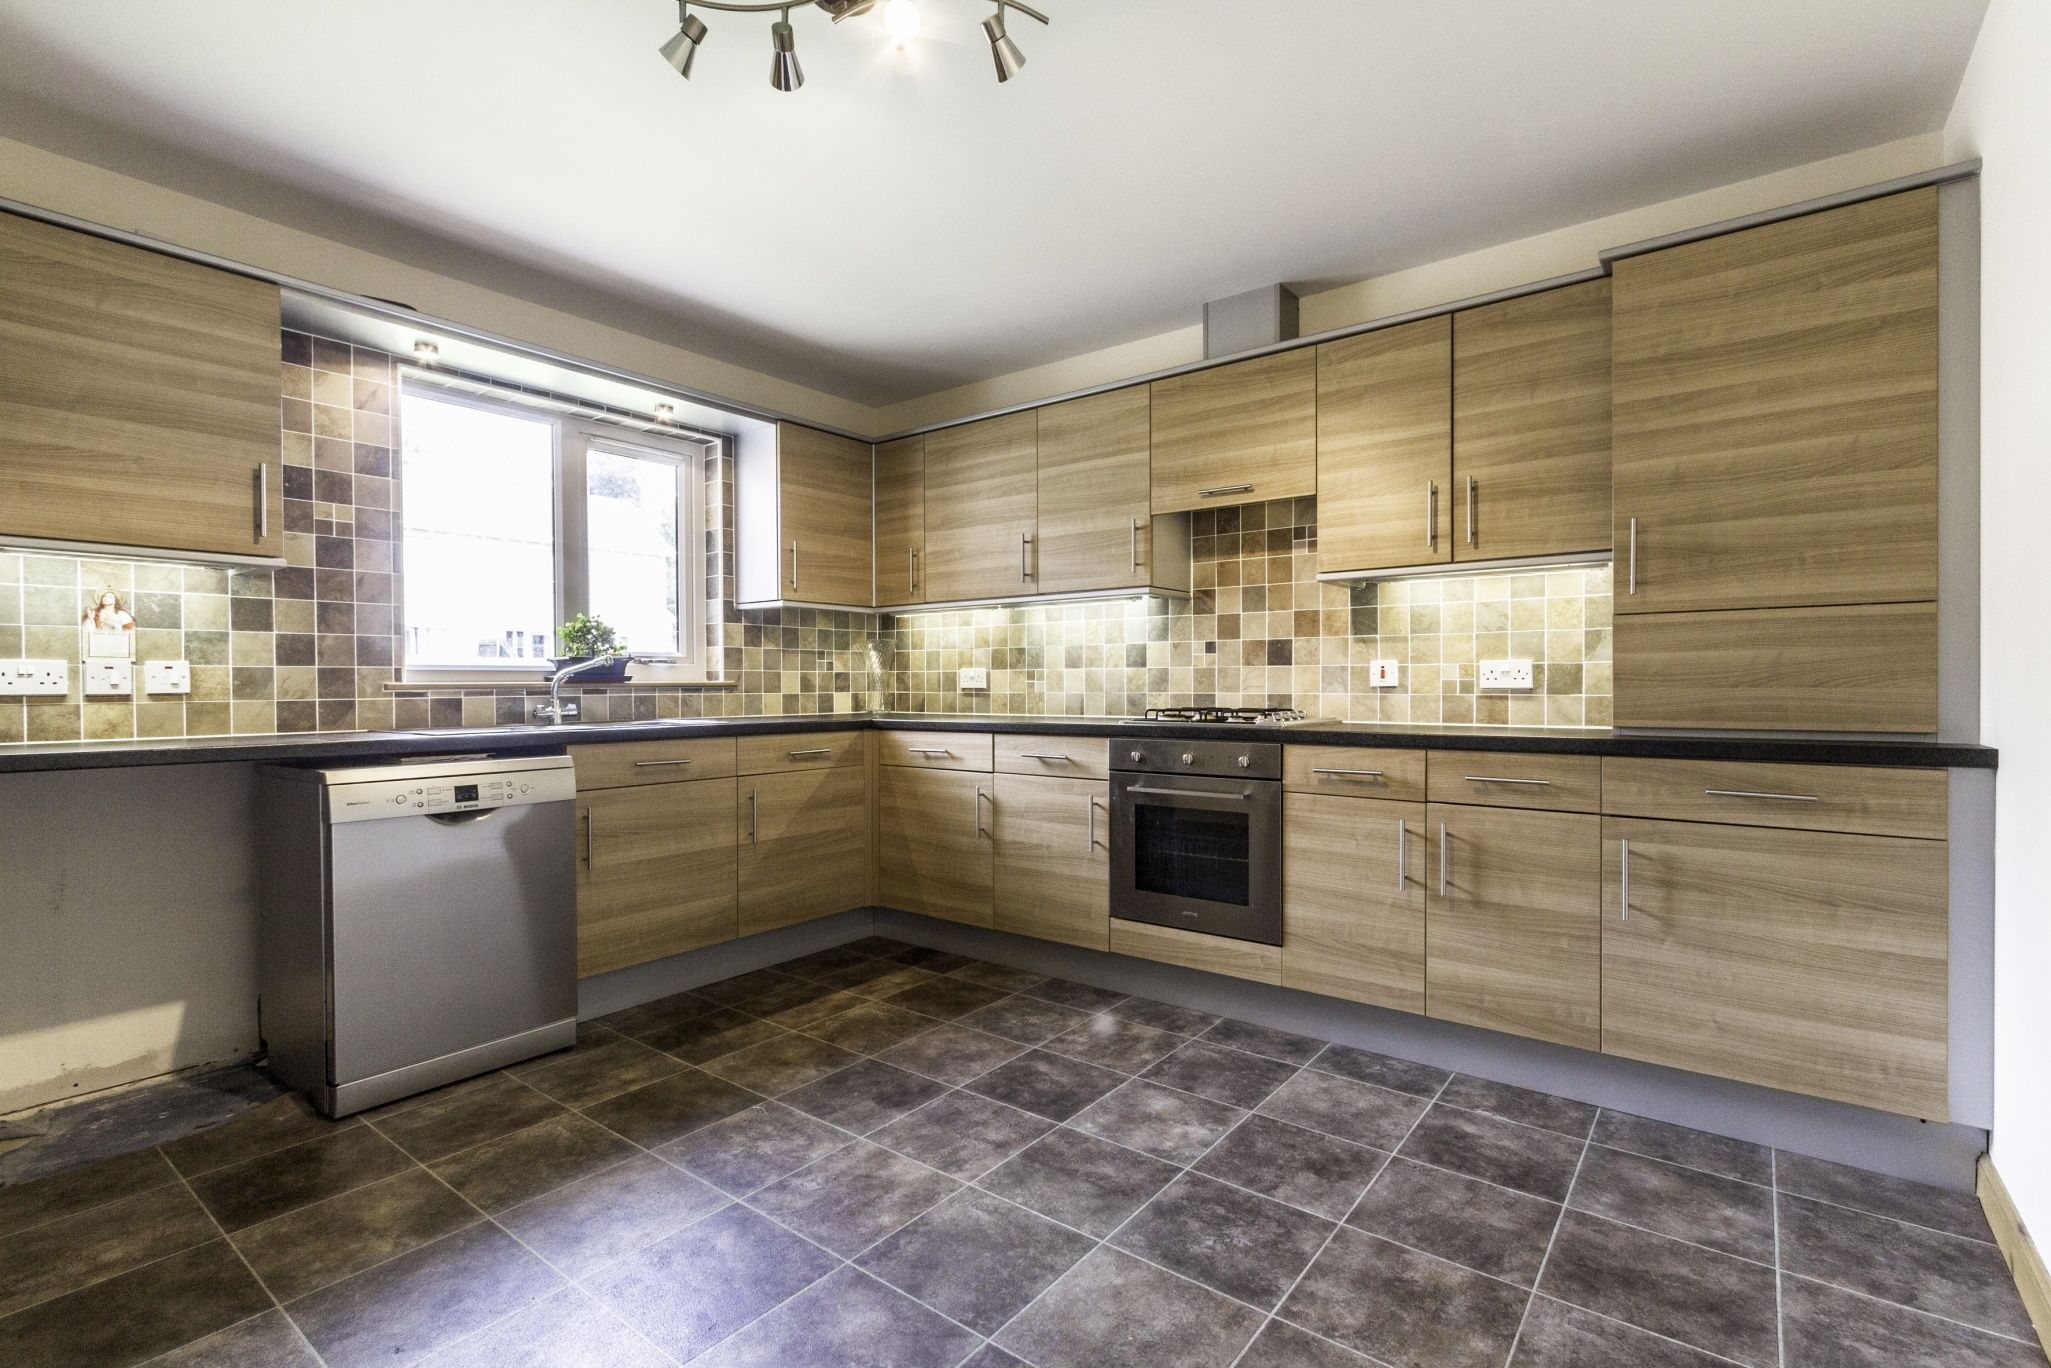 5 McBride Drive, Carnoustie, Angus | McEwan Fraser Legal | Estate Agents Edinburgh  https://www.mcewanfraserlegal.co.uk/properties/search/